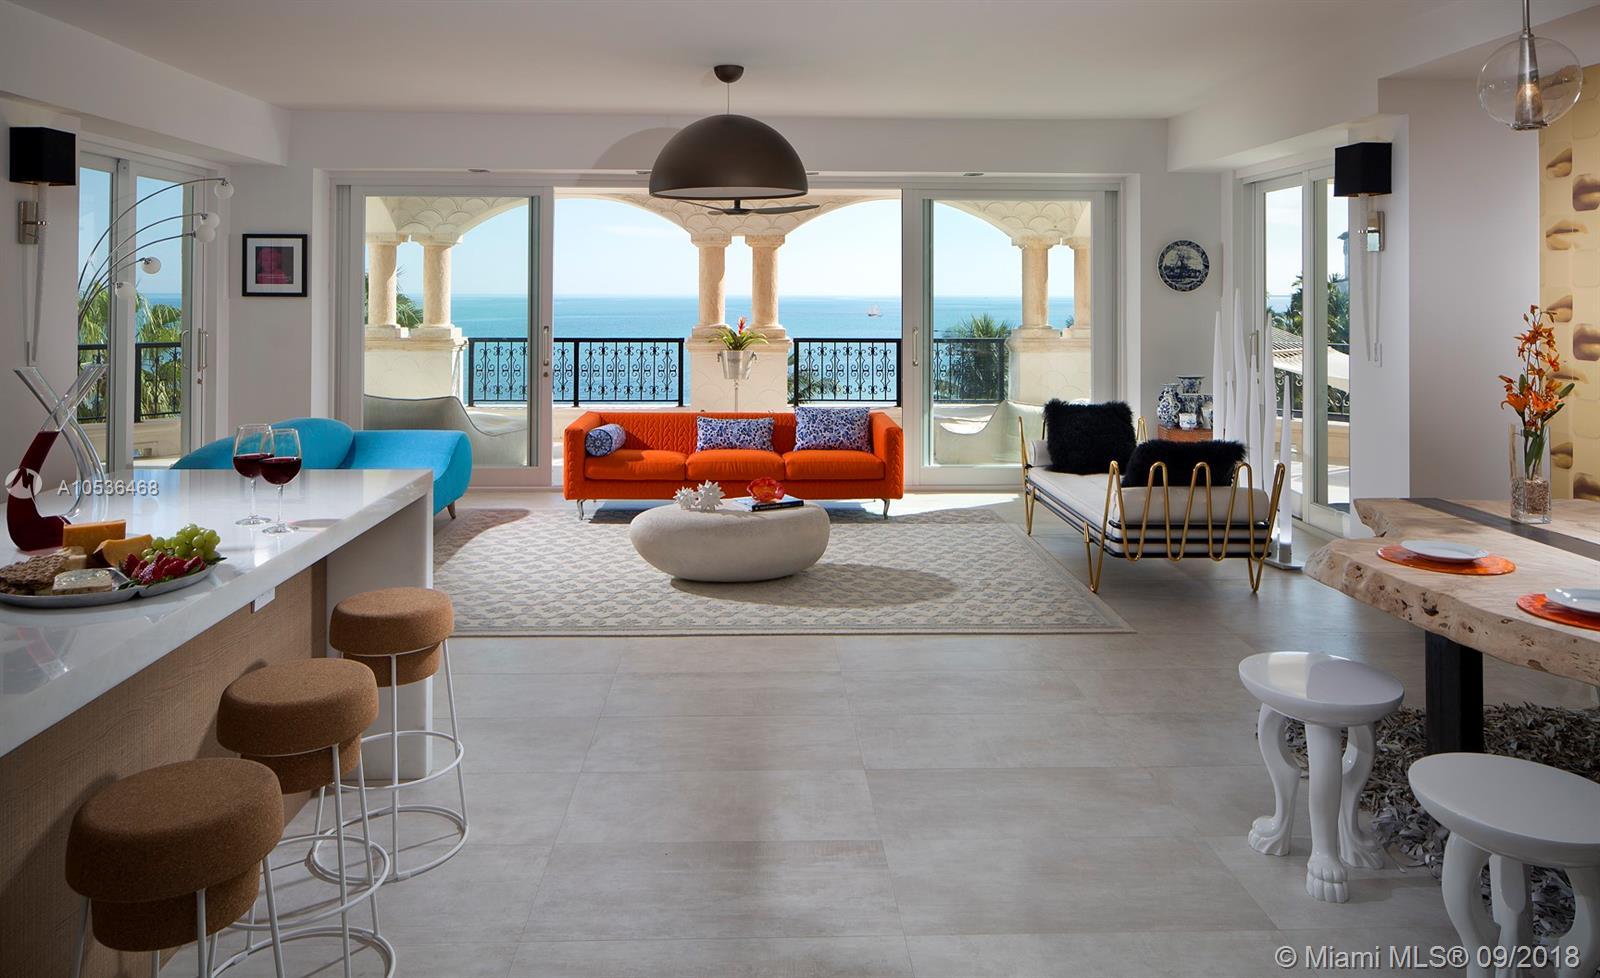 Oceanside #7745 - 7745 fisher island drive #7745, Fisher Island, FL 33109